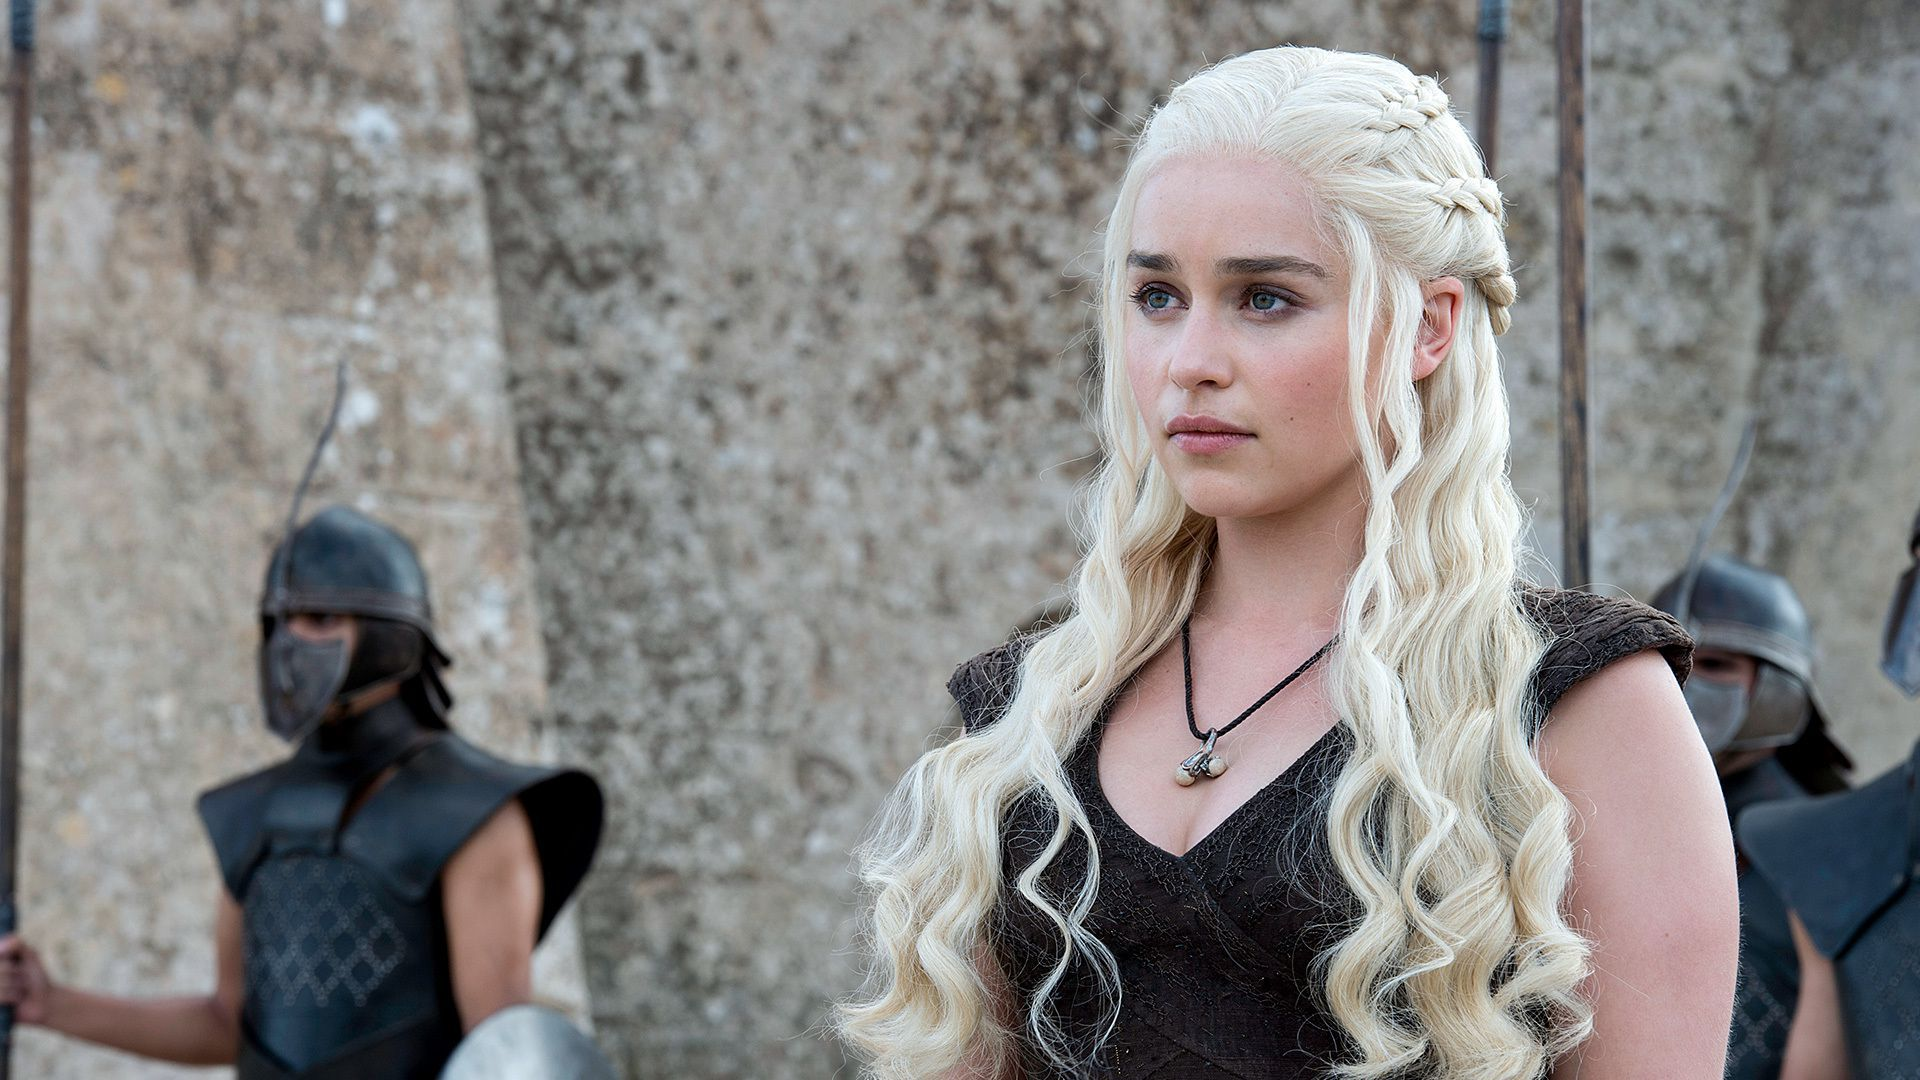 Daenerys Targaryen encarnada por Emilia Clarke (Game of Thrones)